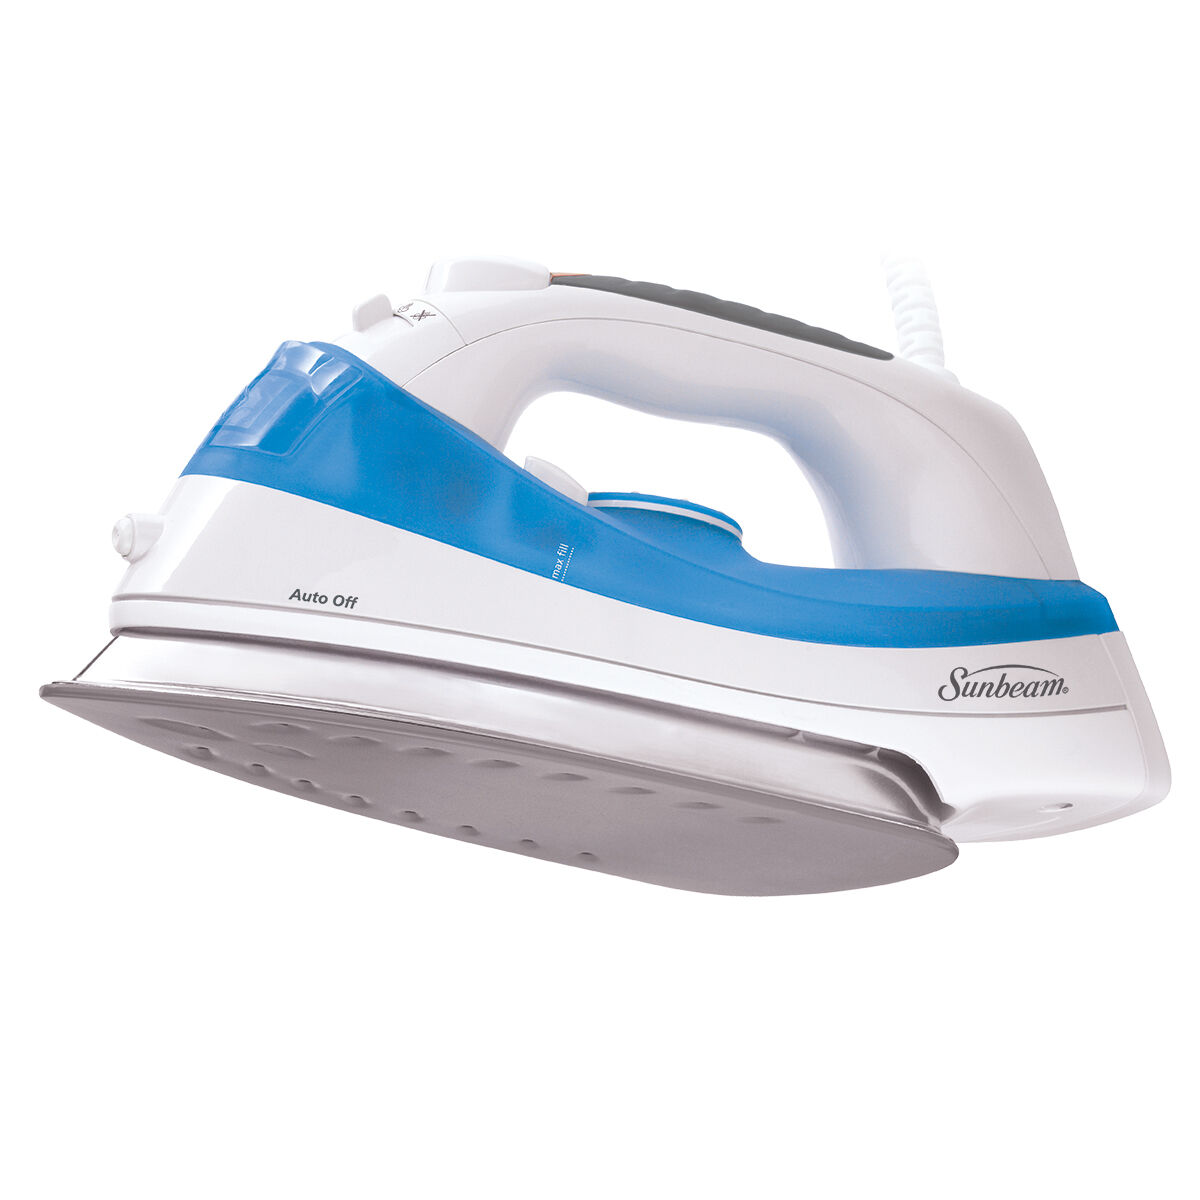 sm kitchen appliances 2 person table sunbeam® simple press™ iron, white & blue